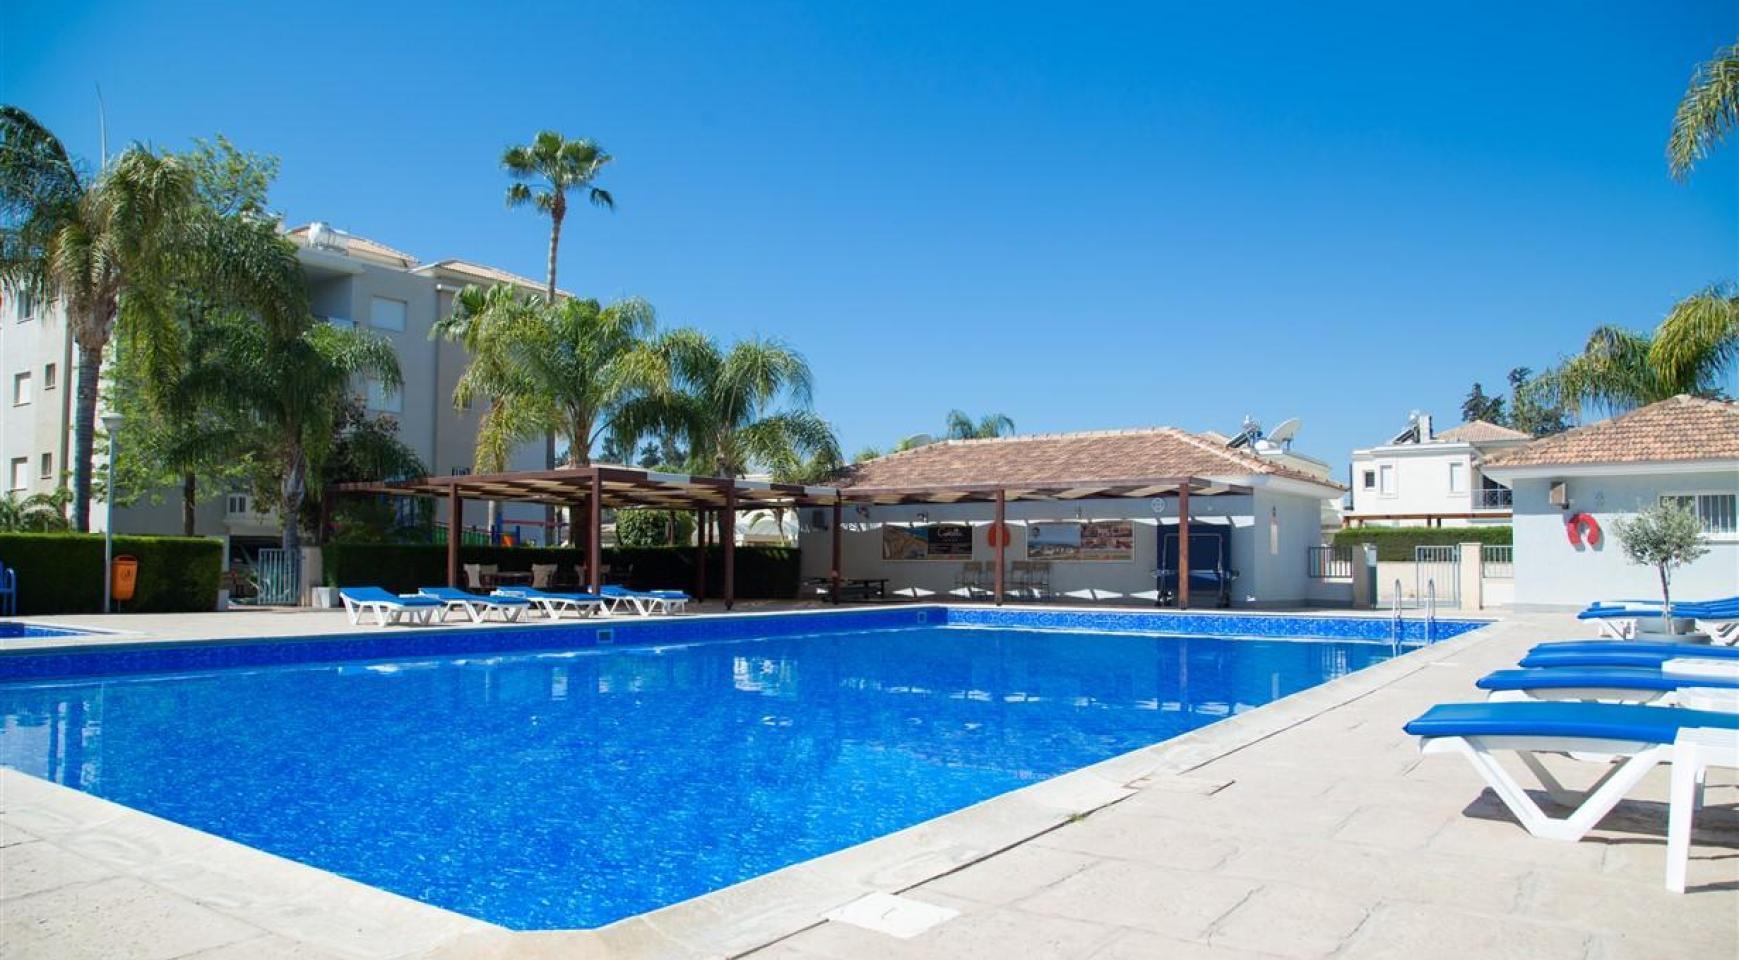 Luxury 2 Bedroom Apartment Mesogios Iris 304 in the Tourist area near the Beach - 27